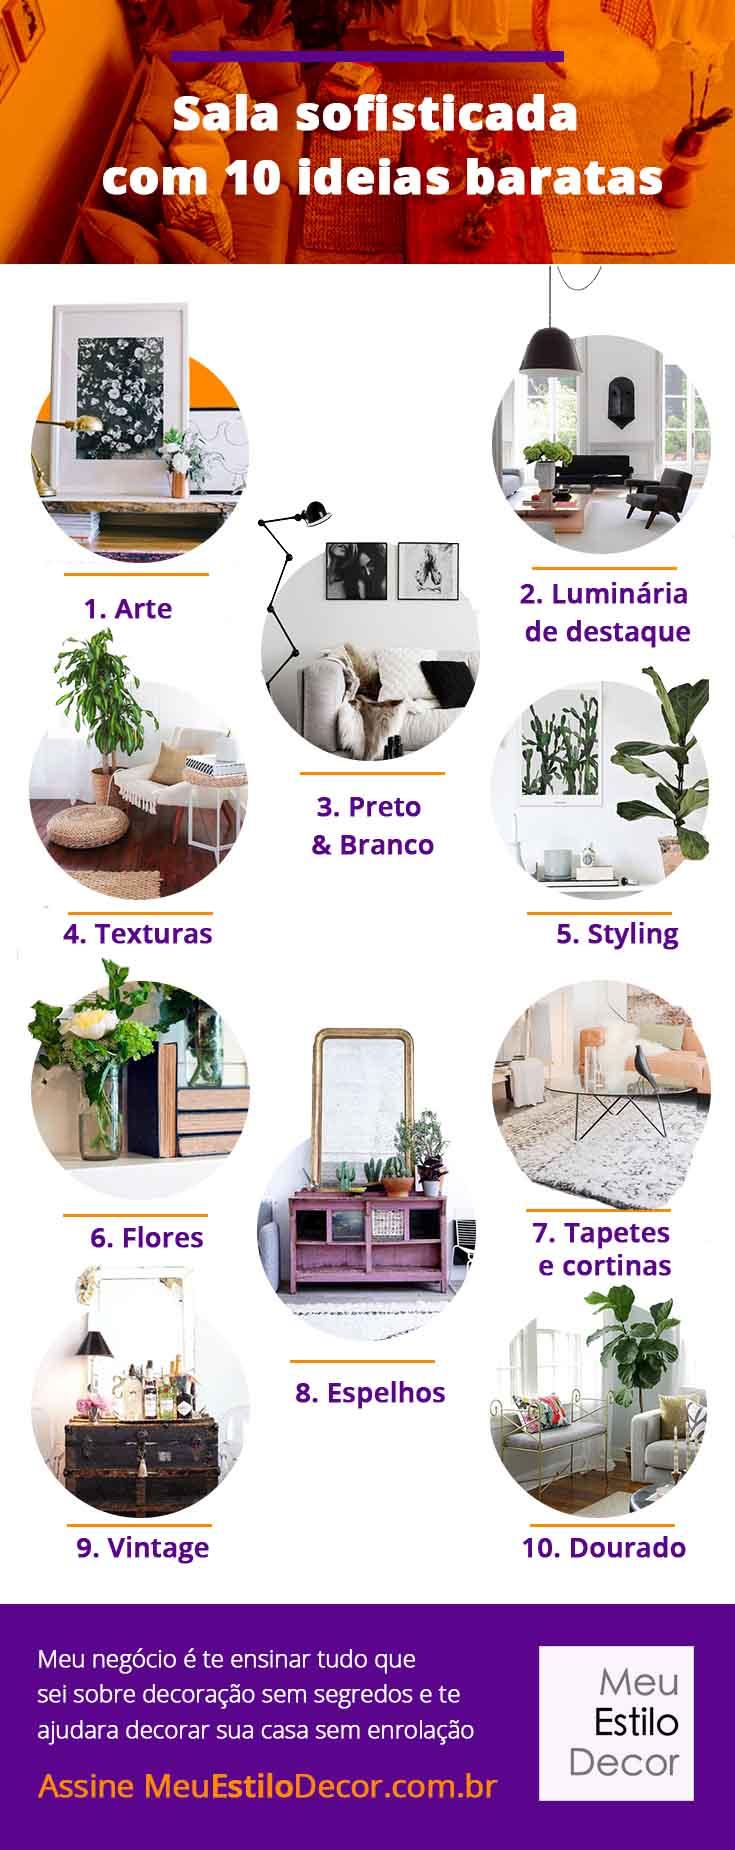 sala-sofisticada-ideias-baratas-_infografico